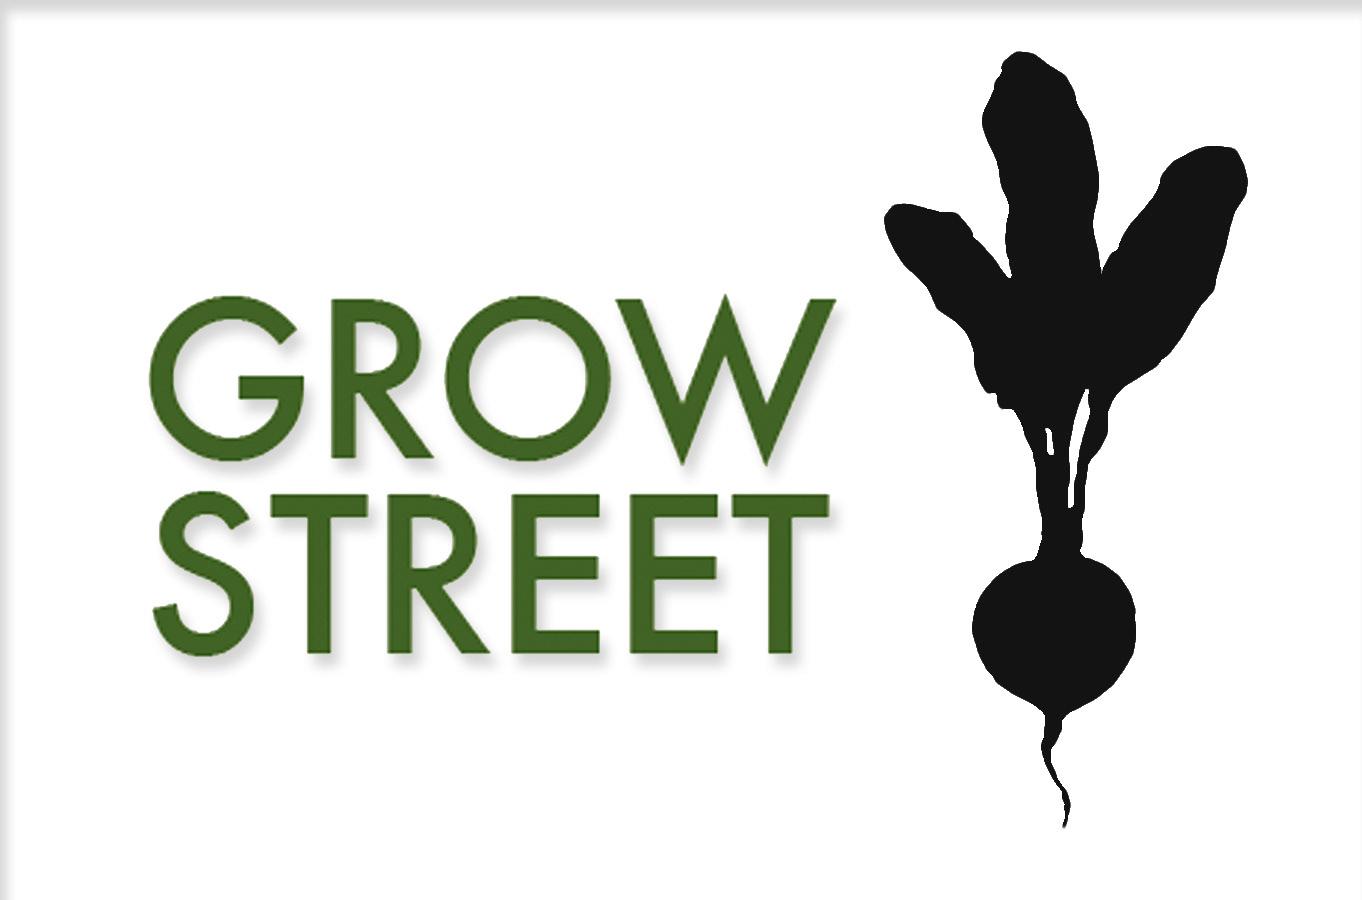 Julia joseph designs grow street idenitity grow street identity and business cards urban organic farming in chicago colourmoves Choice Image